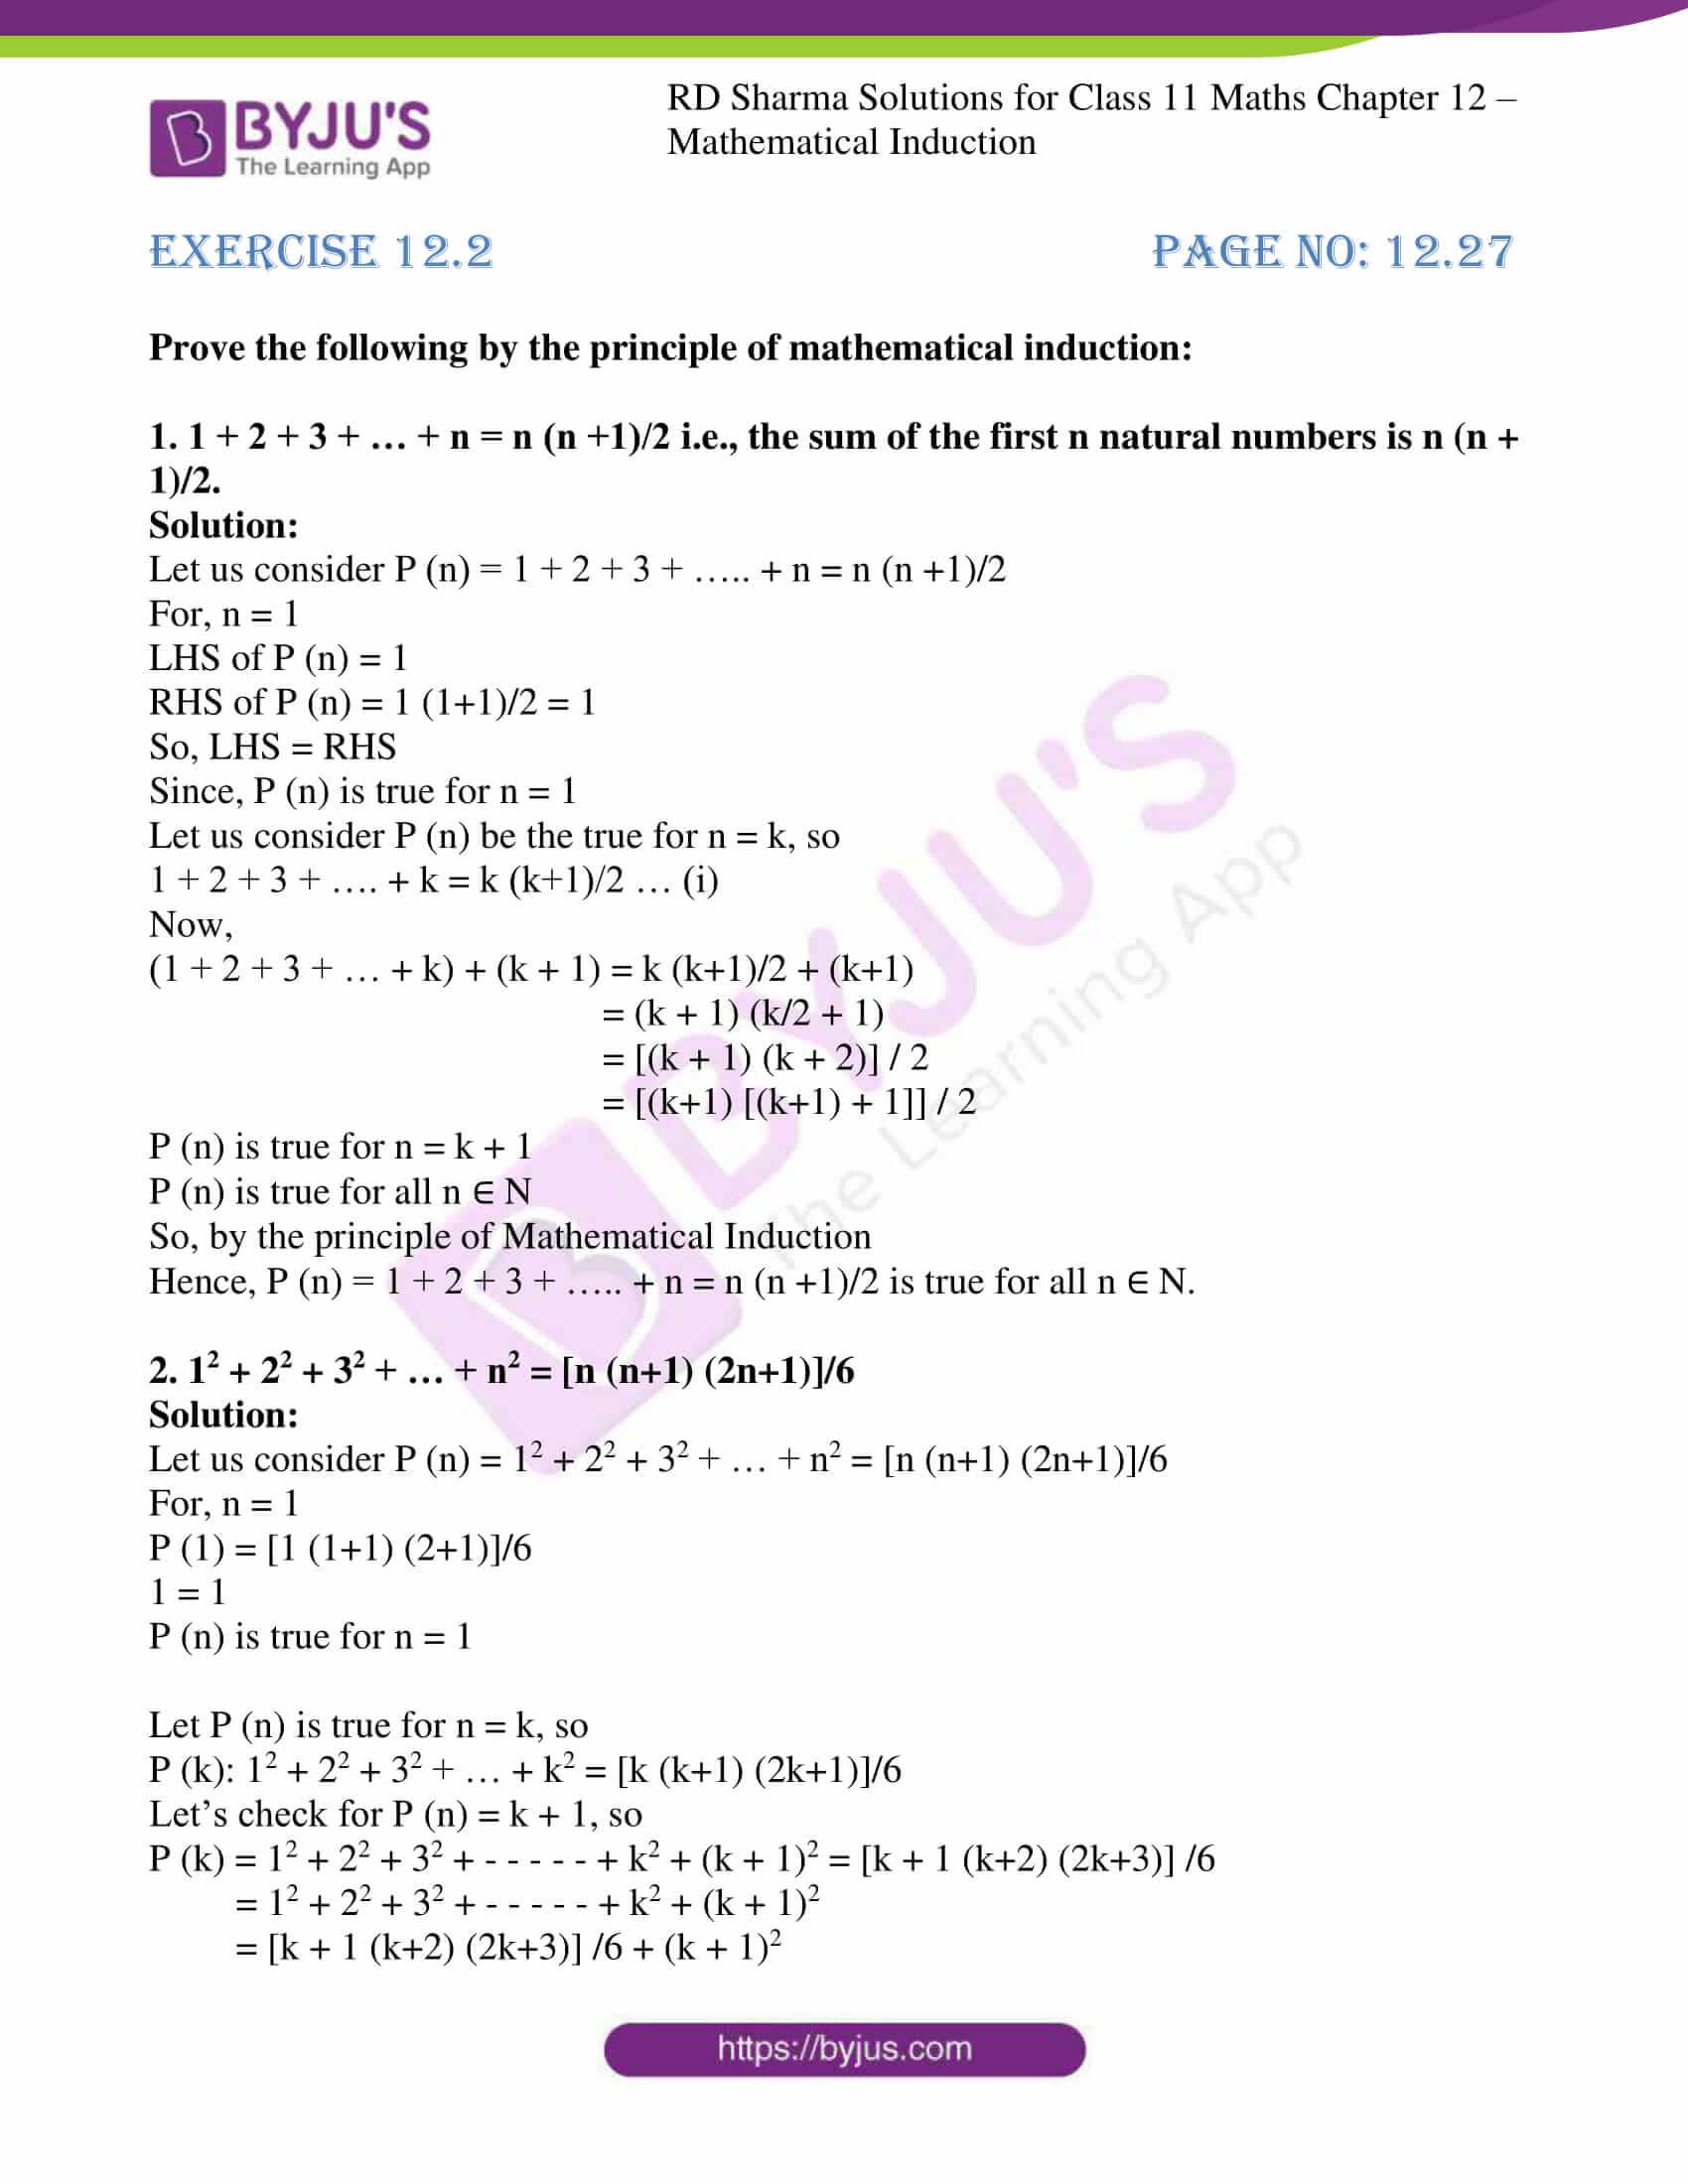 rd sharma class 11 maths ch 12 ex 2 01